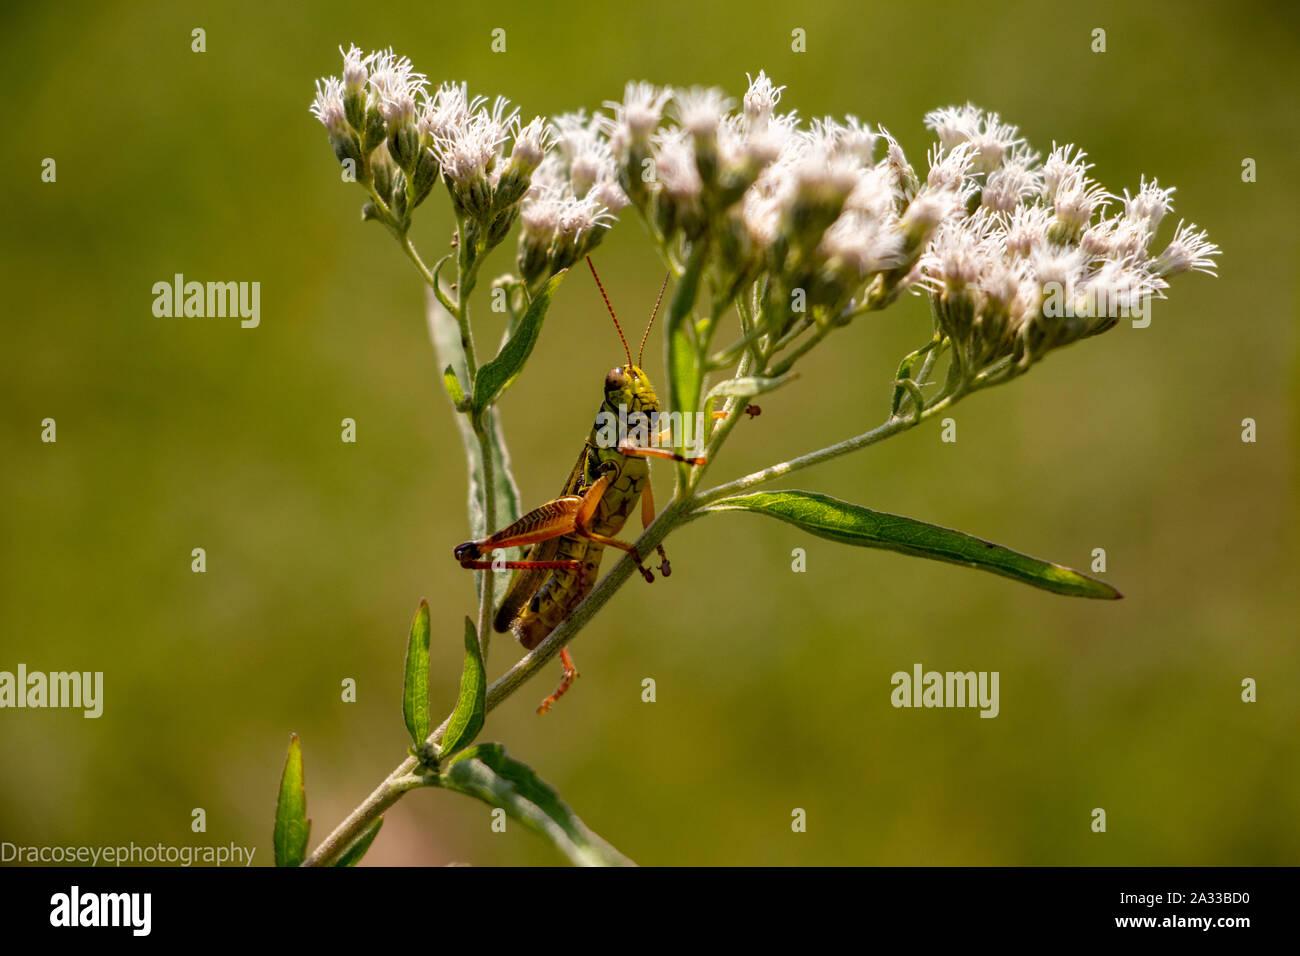 Grasshopper relaxing on a flower Stock Photo